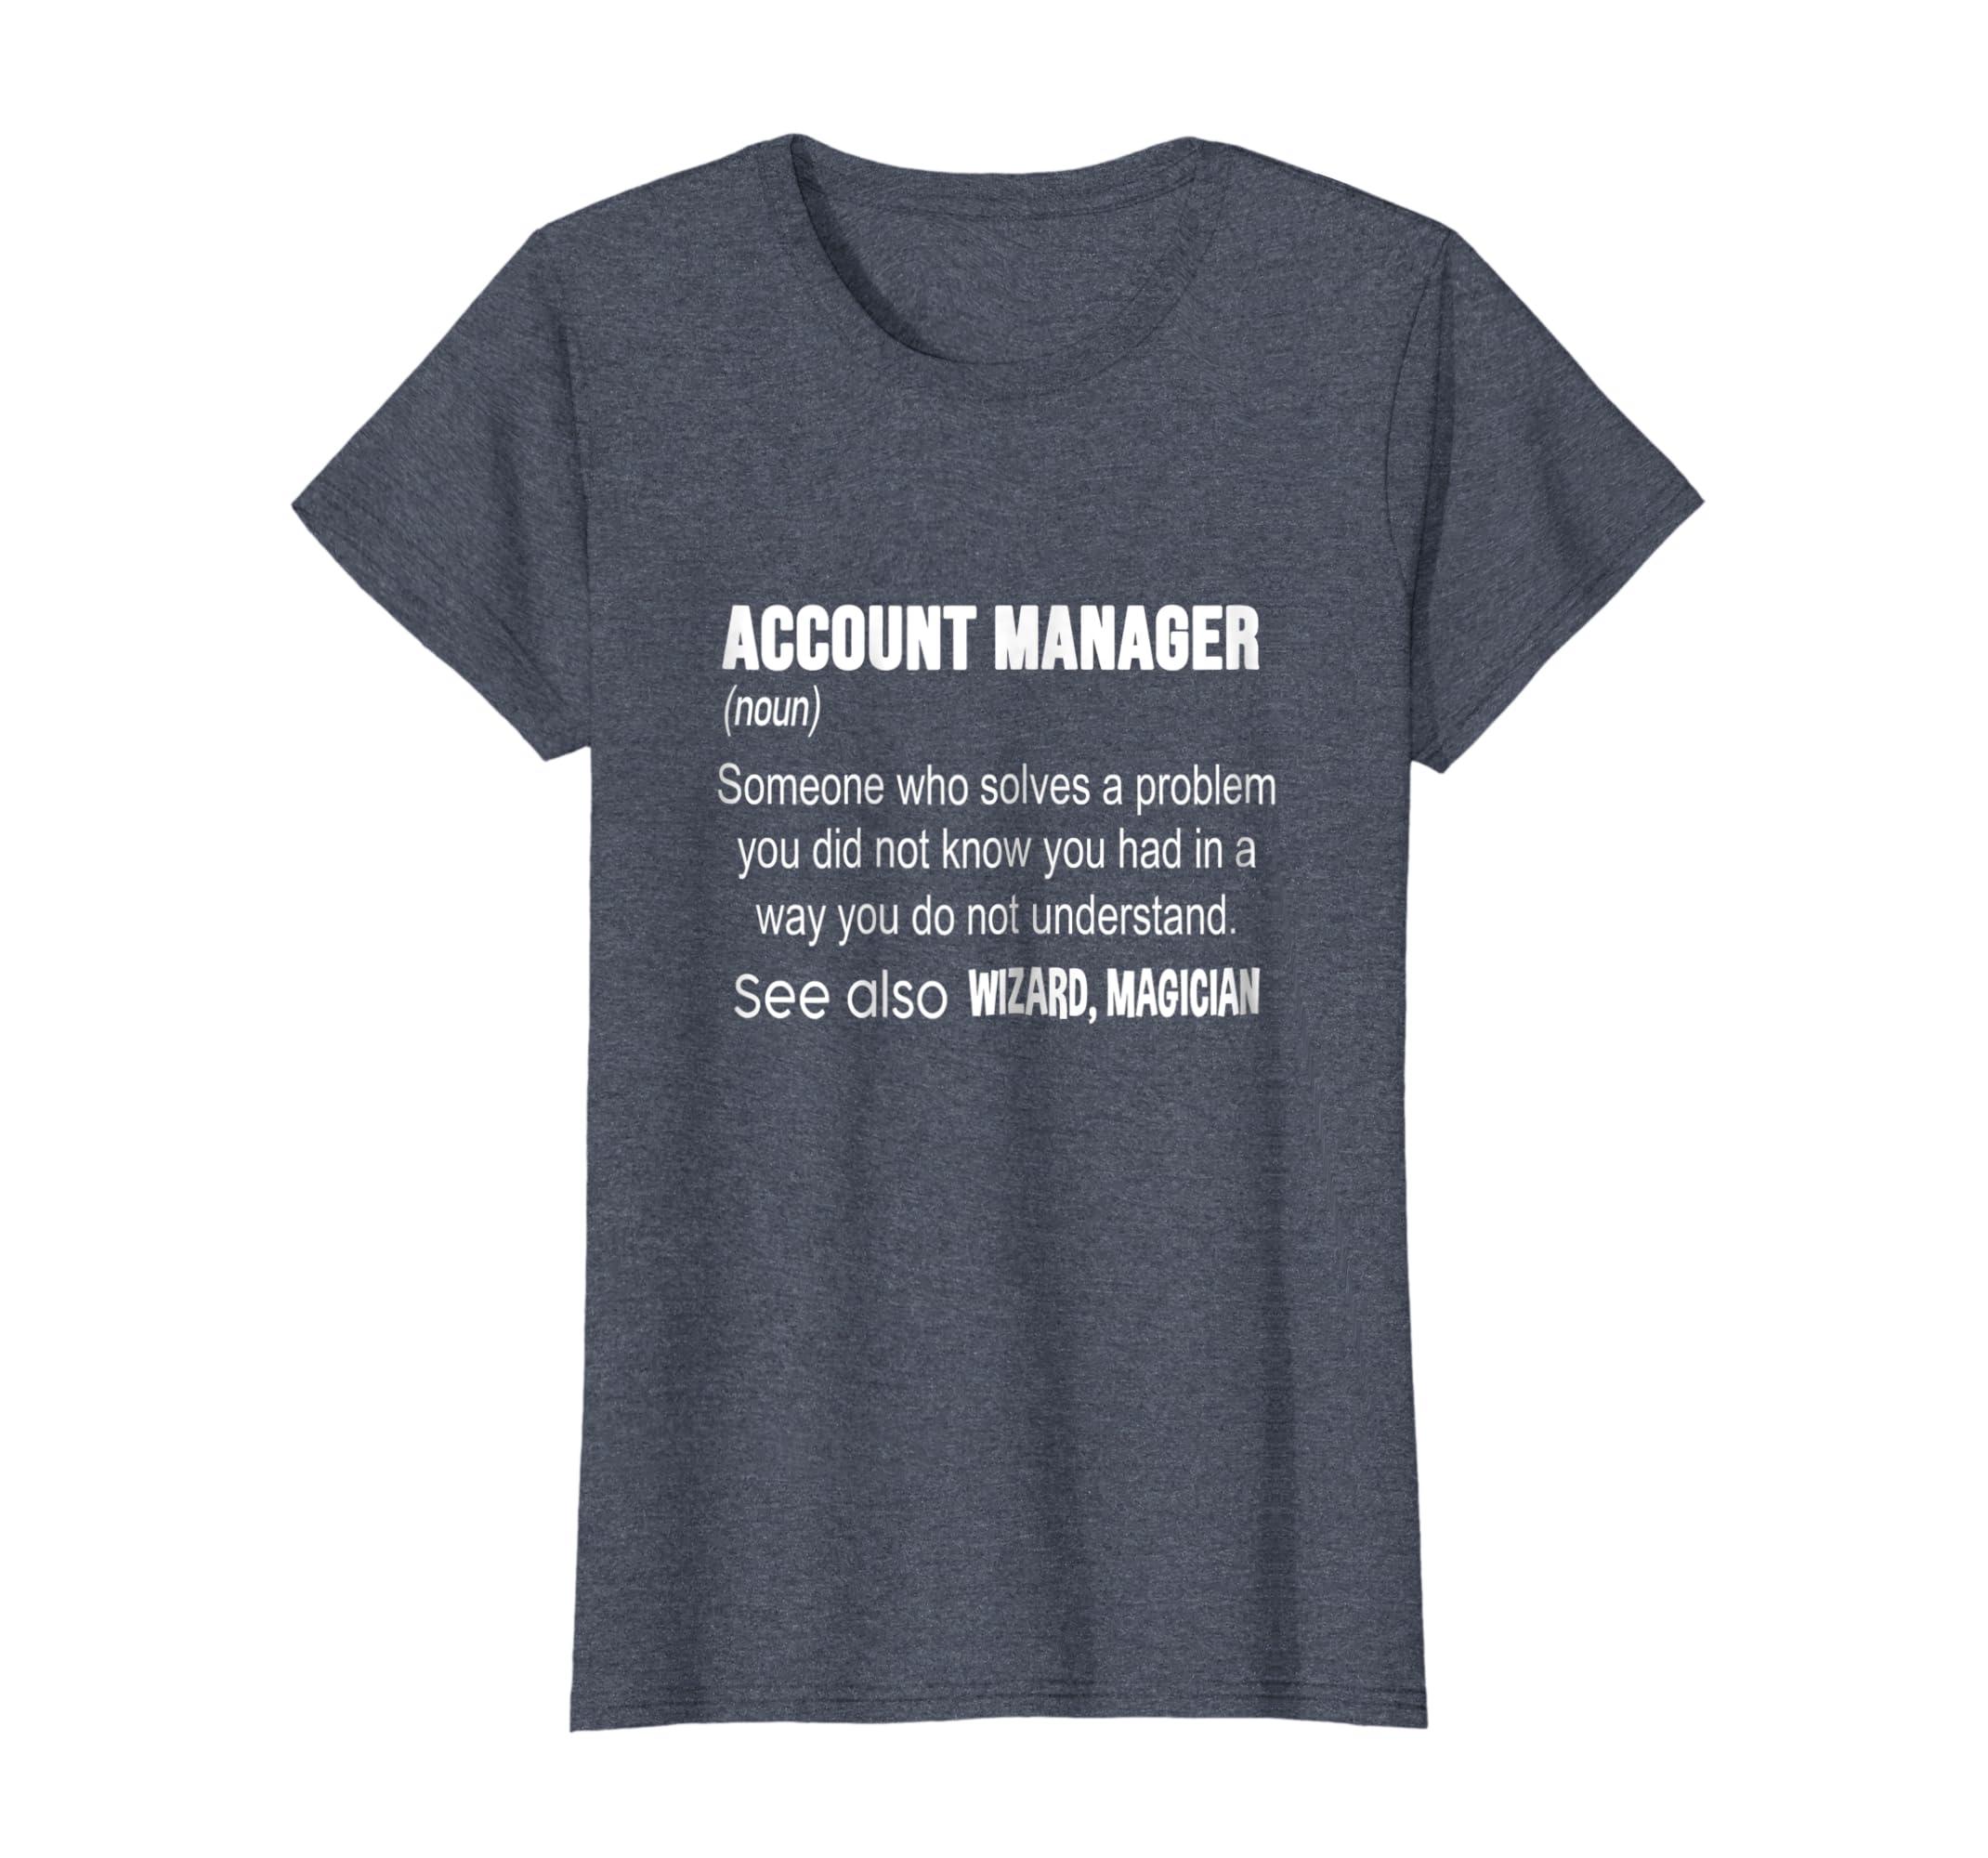 ea56ba241 Amazon.com: Account Manager T-Shirt: Clothing